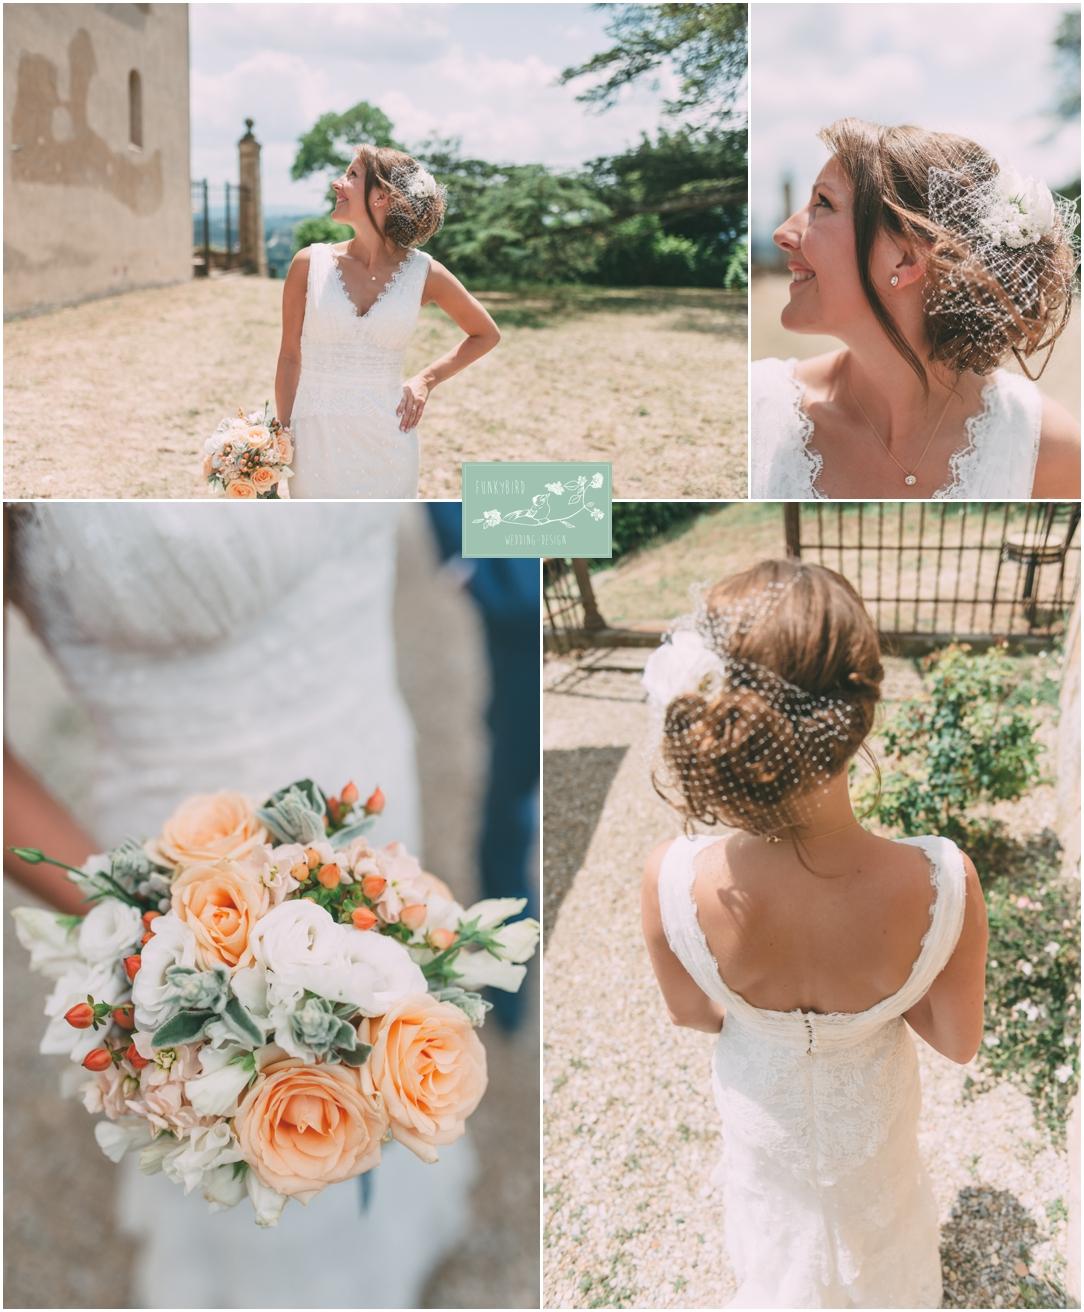 trouwen in toscane_flowers in Tuscany_tuscany wedding_0138.jpg